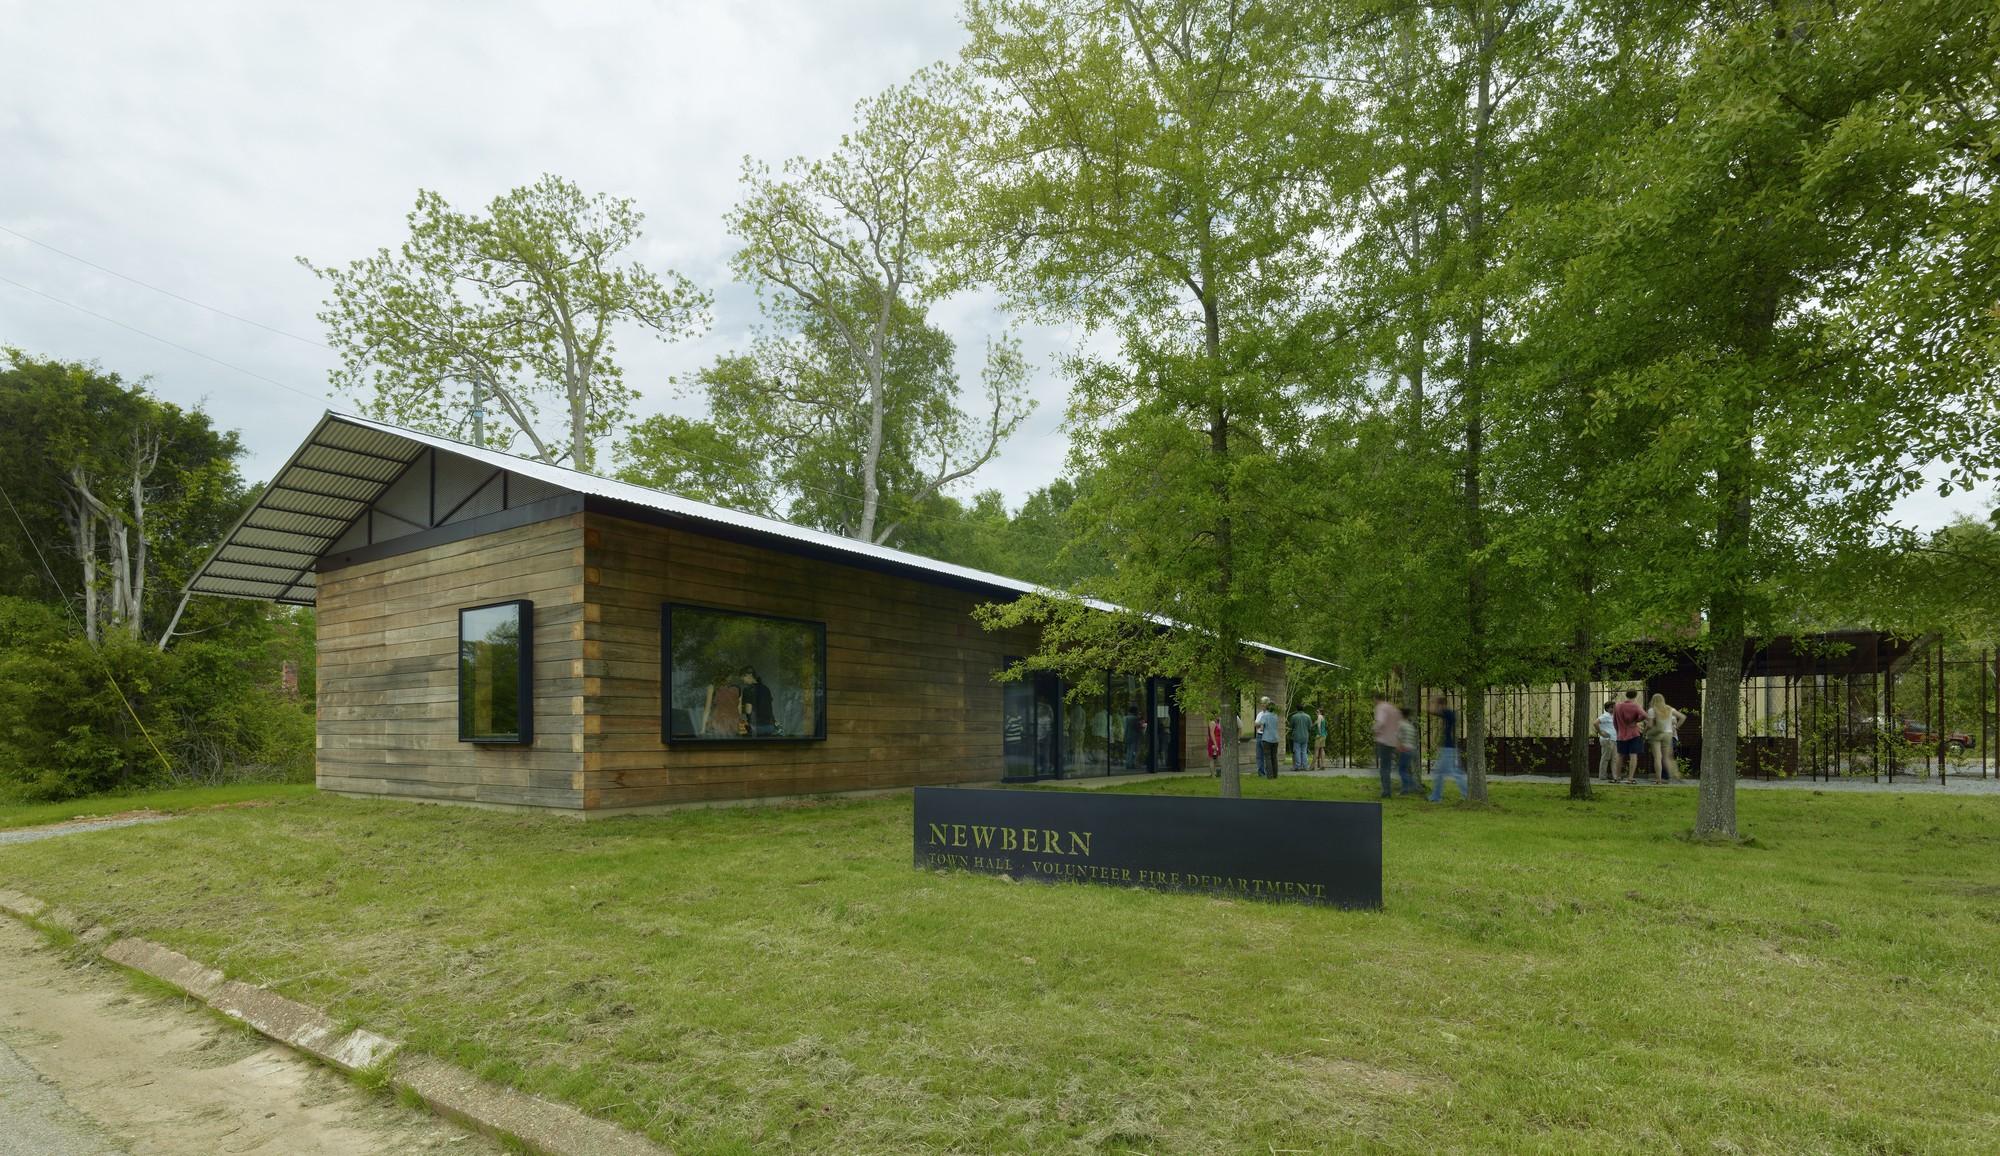 Newbern Town Hall / Auburn University Rural Studio | ArchDaily